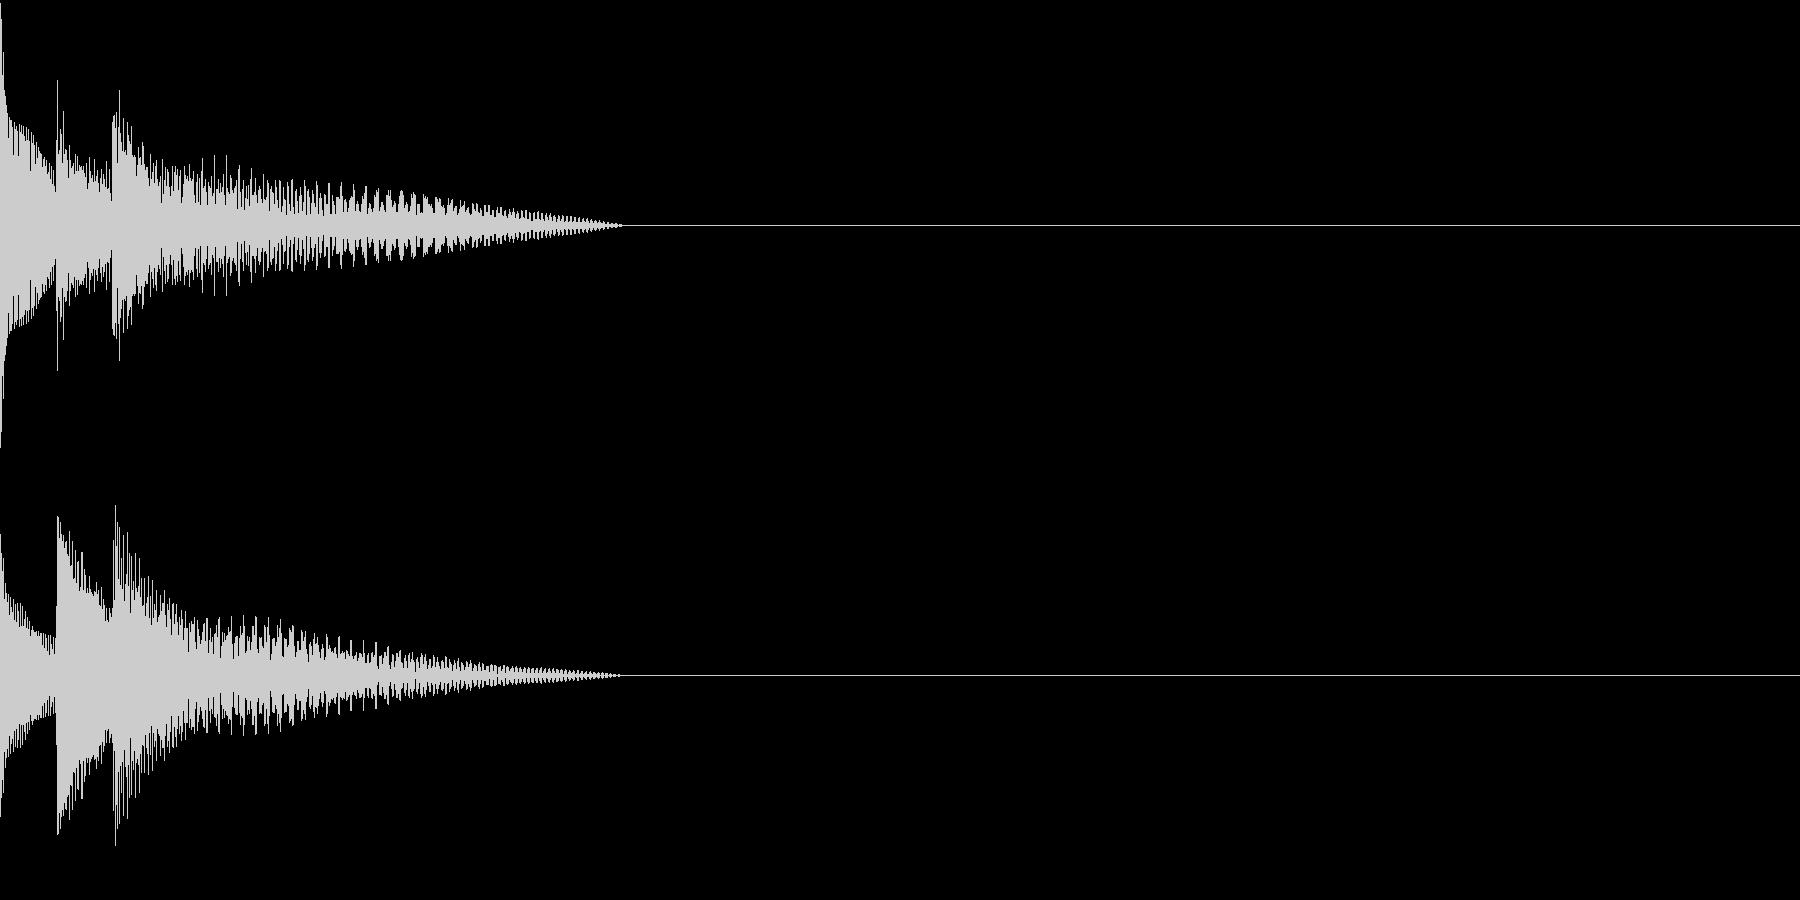 Cursor セレクト・カーソルの音13の未再生の波形